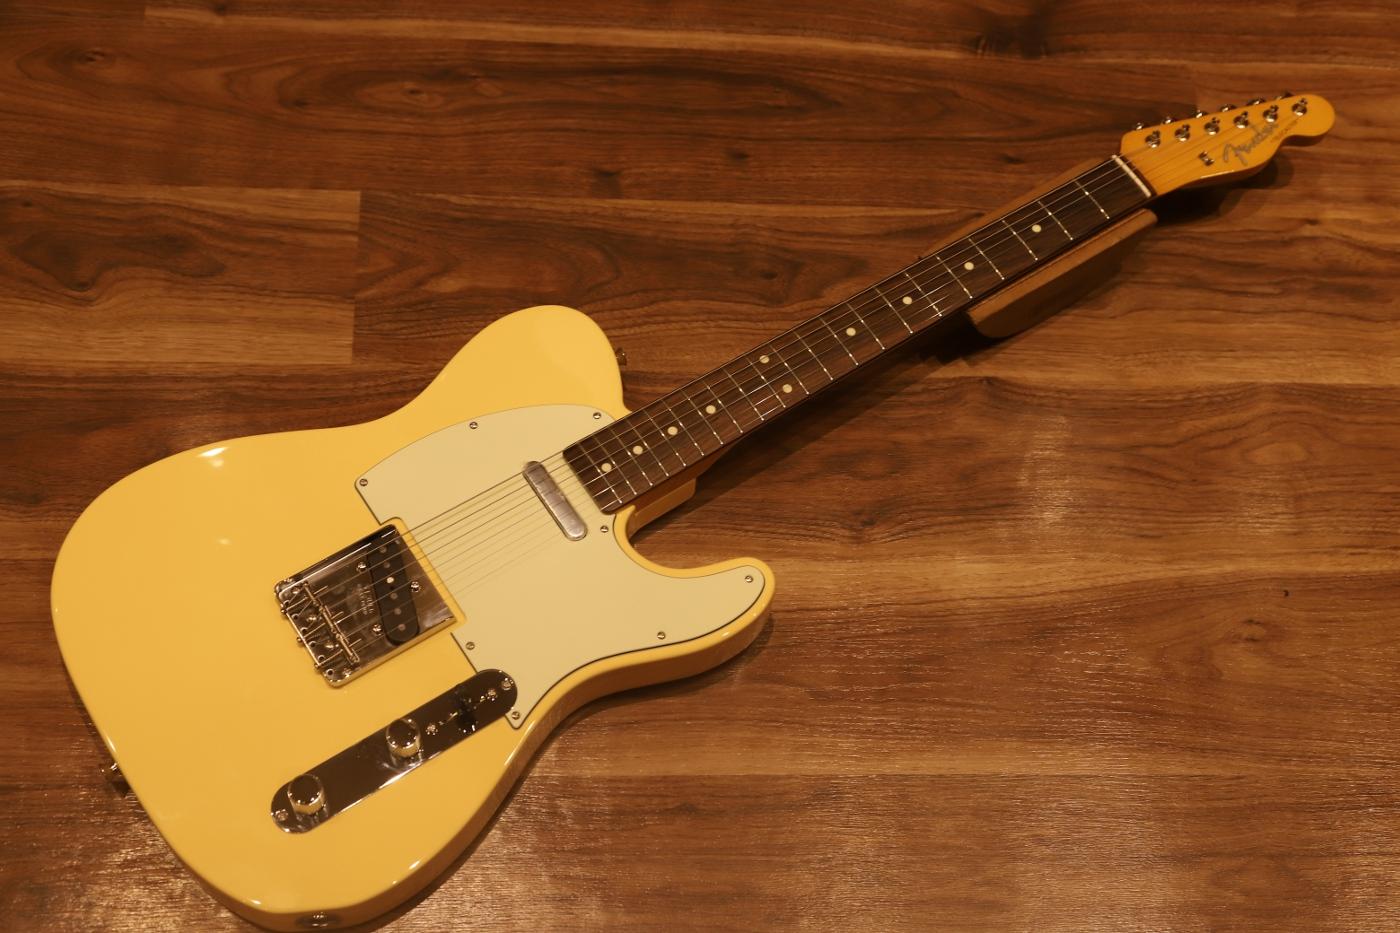 Fender MADE IN JAPAN 2018 LIMITED Traditional' 60s Telecaster®, Rosewood  Fingerboard, Vintage White fender telecaster limitation product